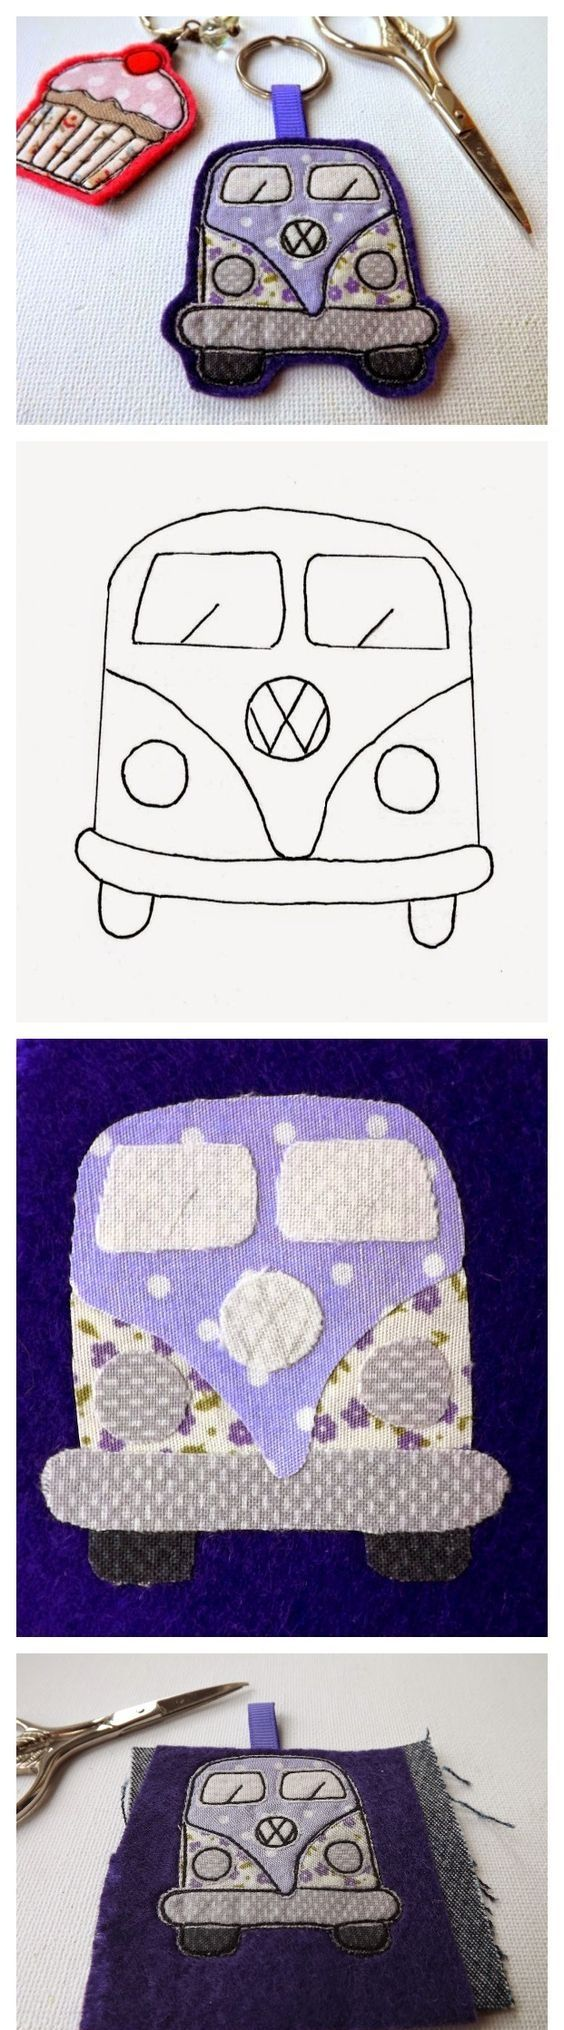 Tutorial llavero fieltro furgoneta Volskwagen con patrón